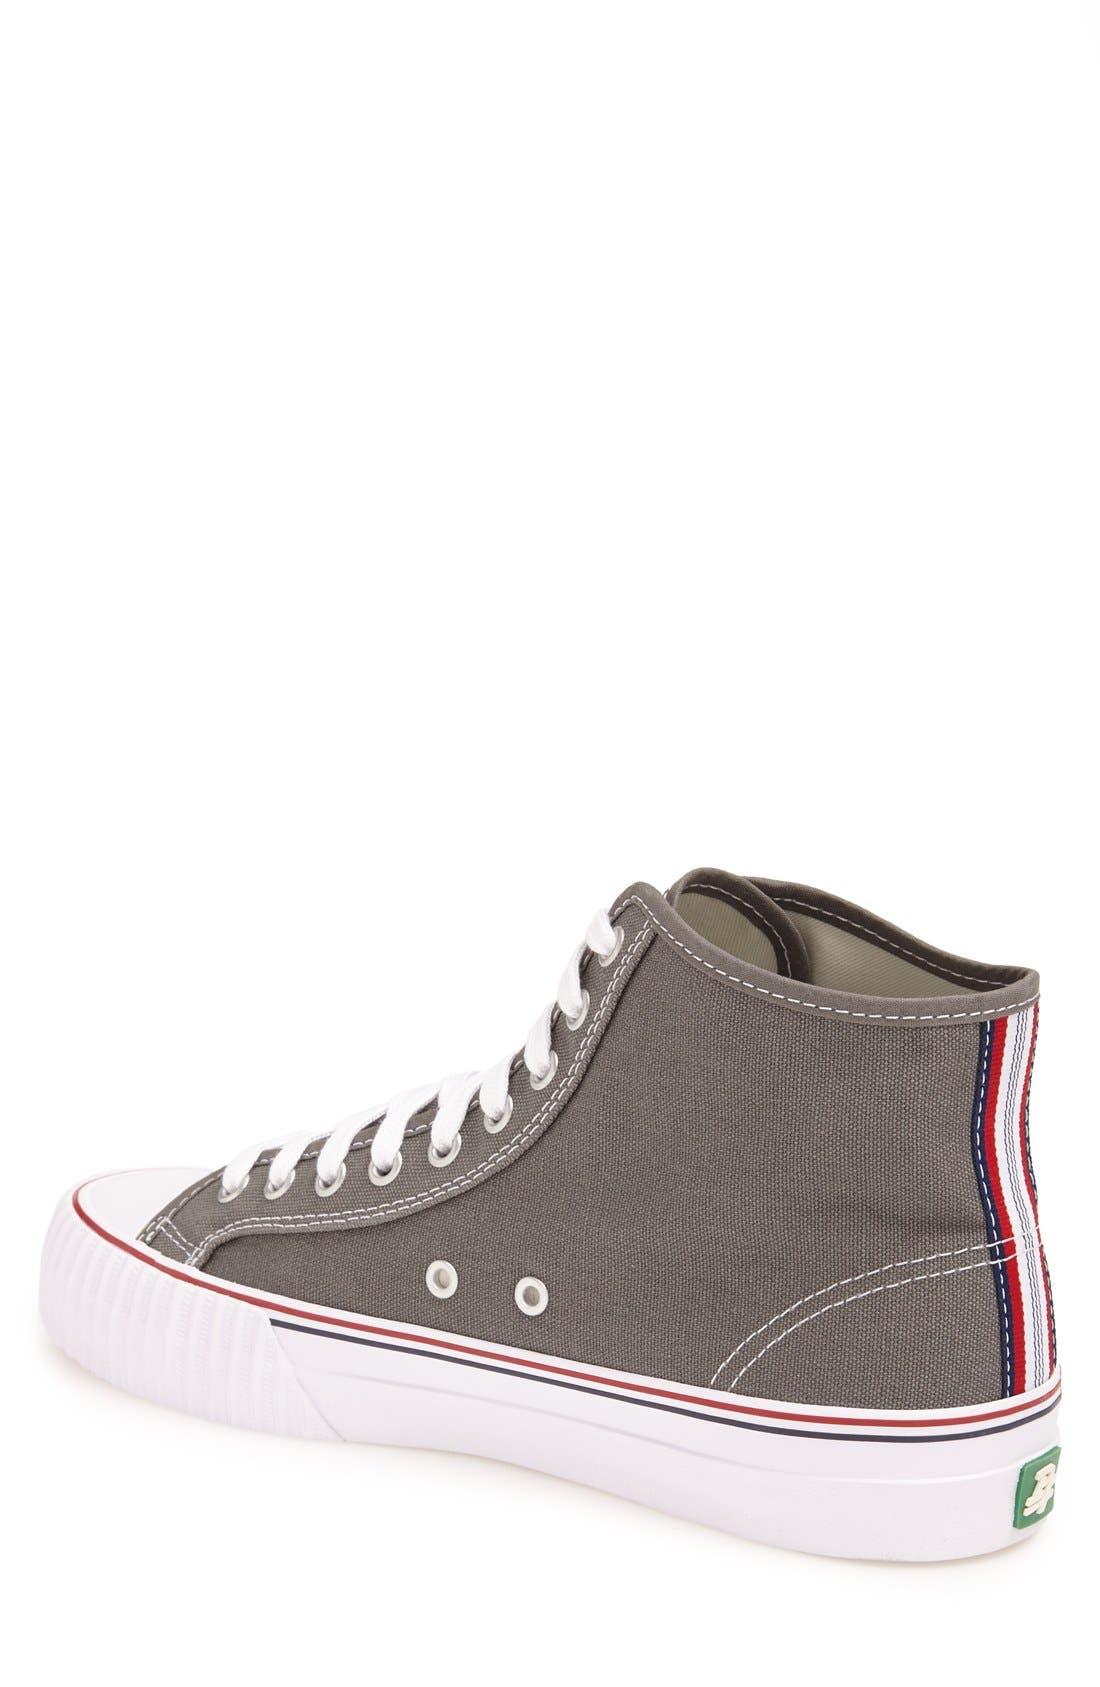 'Center Hi' Canvas Sneaker,                             Alternate thumbnail 4, color,                             030